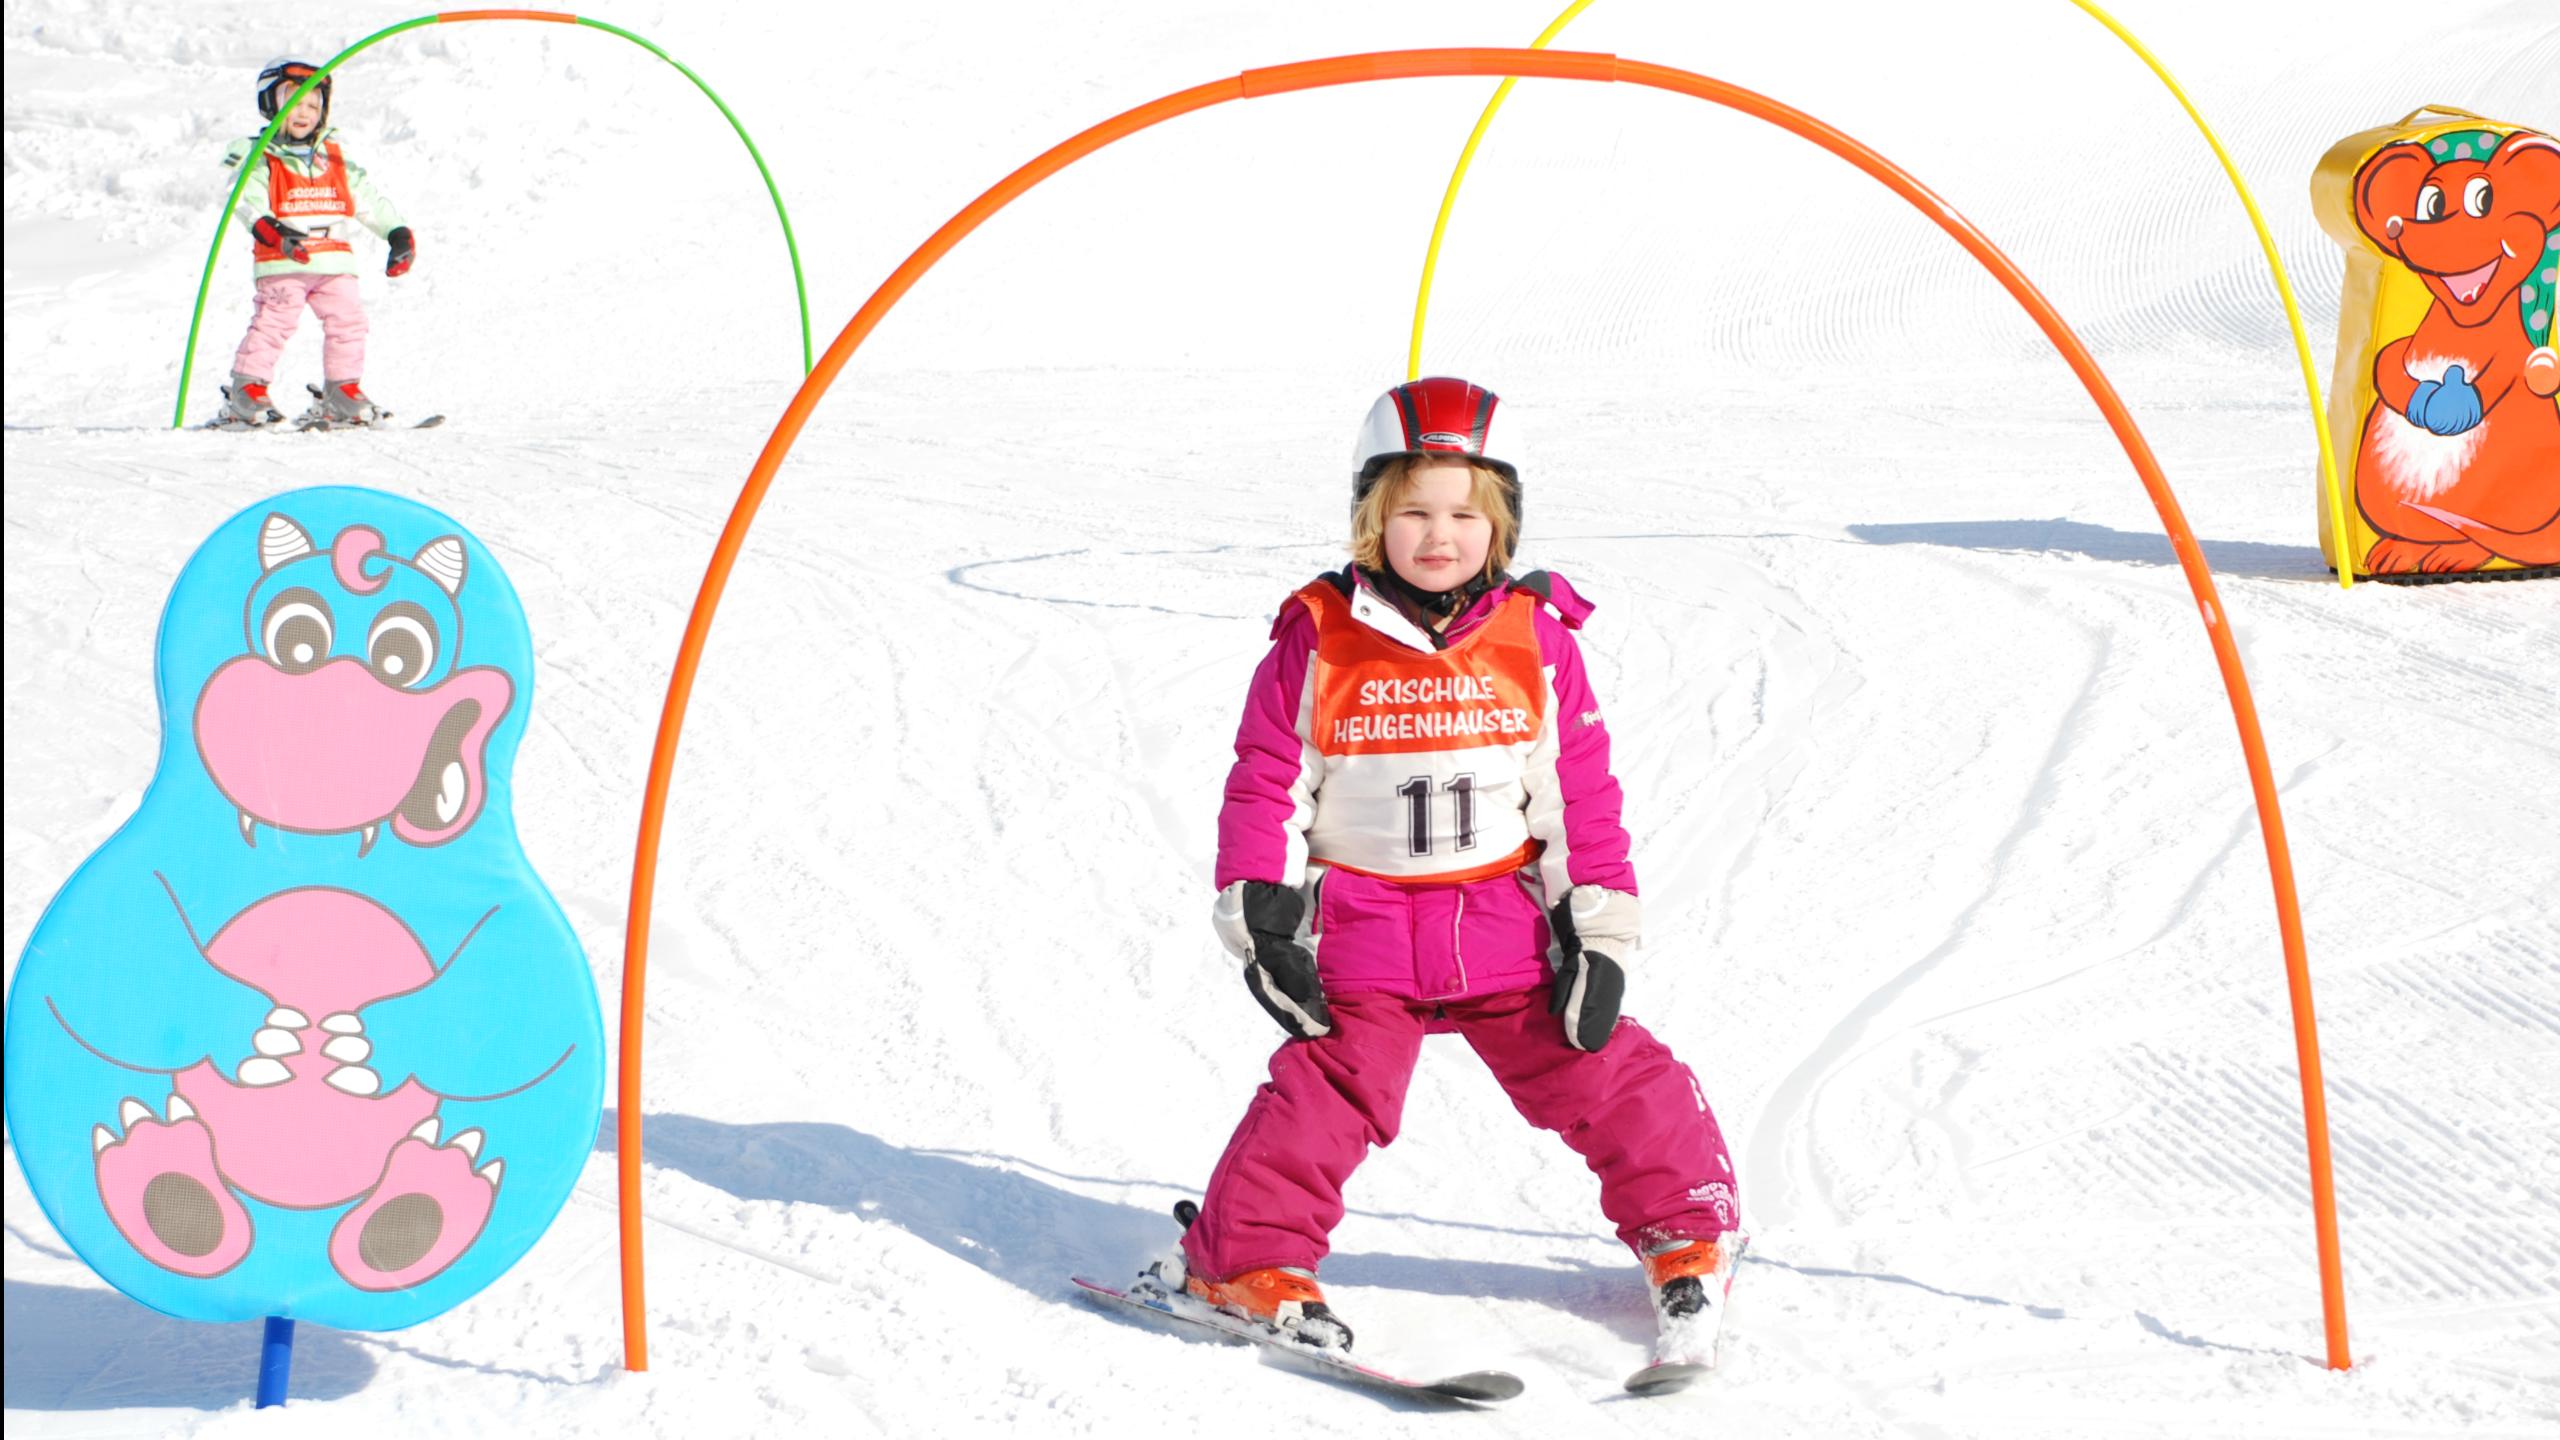 Clases de esquí para niños para principiantes